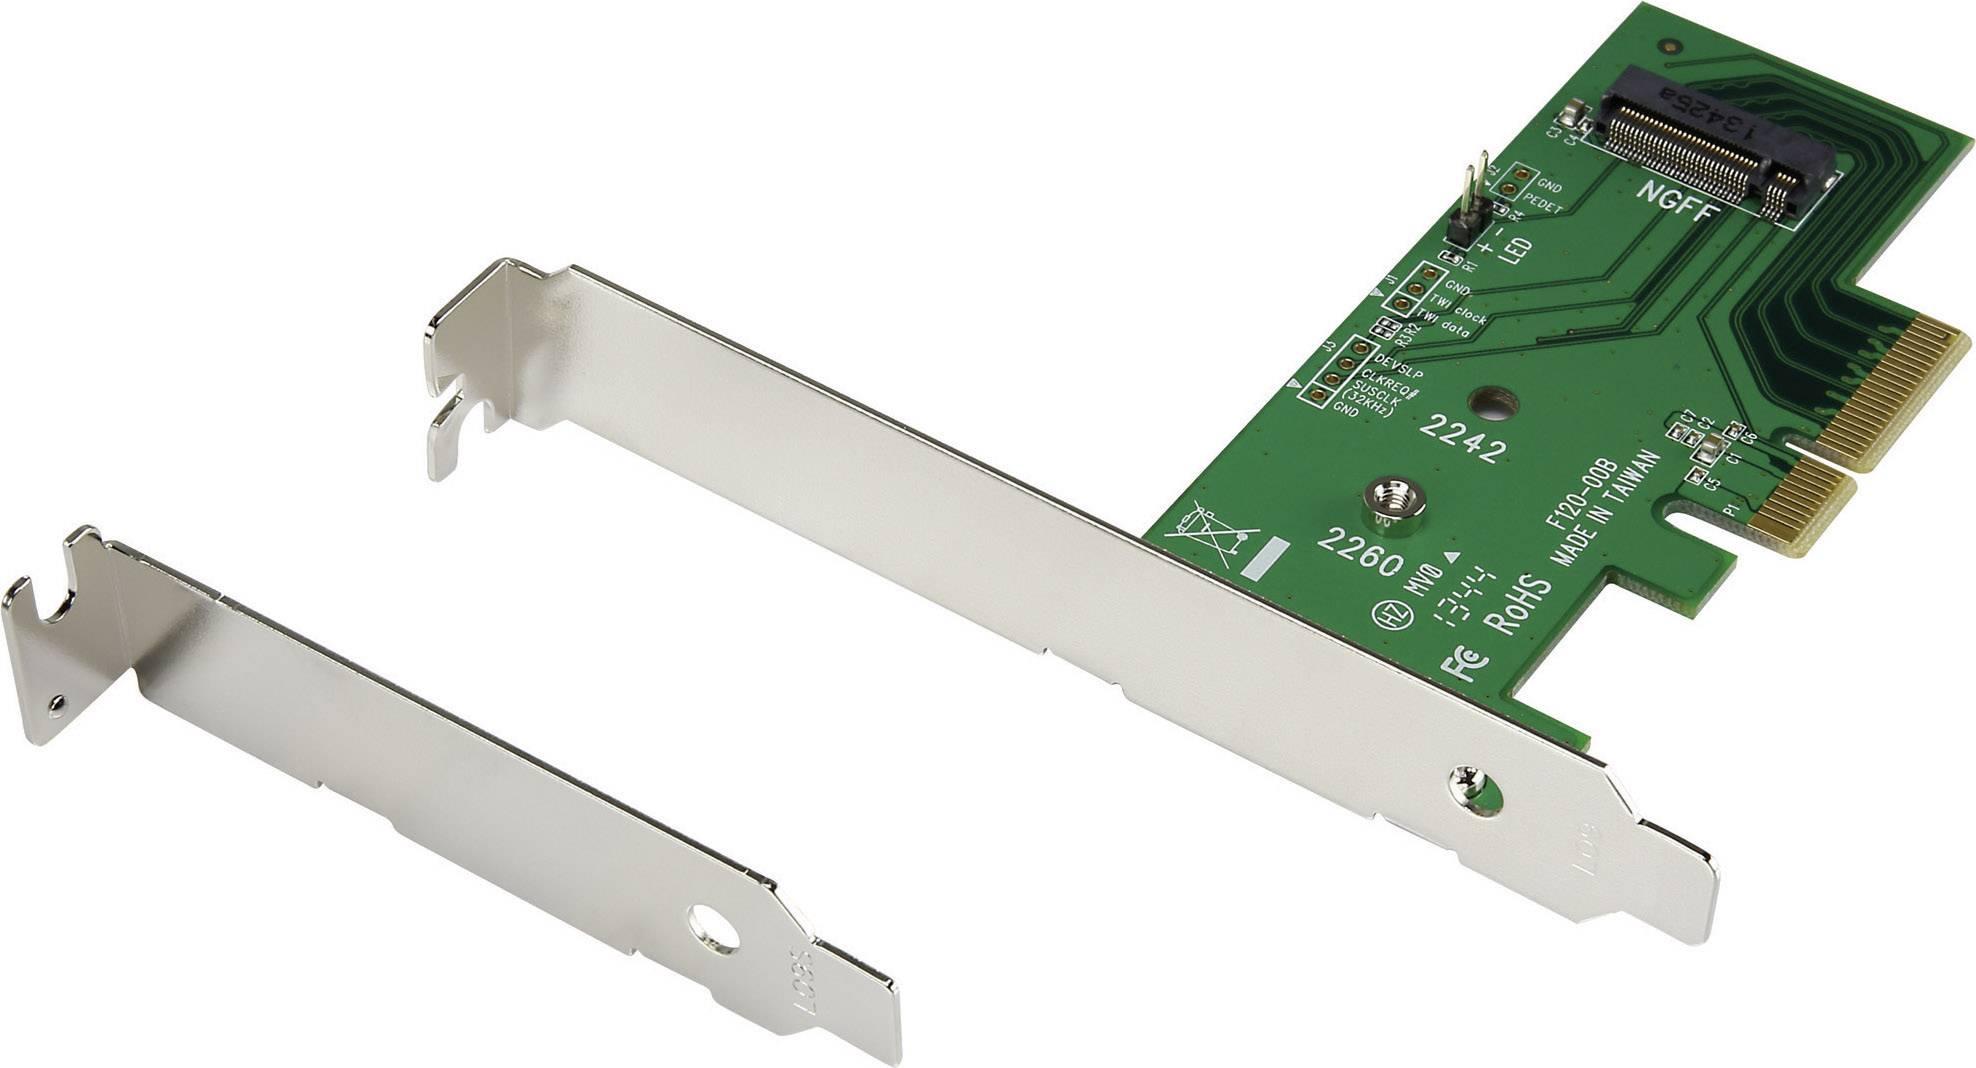 Konvertor rozhrania Renkforce 28554C168 RF-2384500, [1x PCI-Express - 1x ]